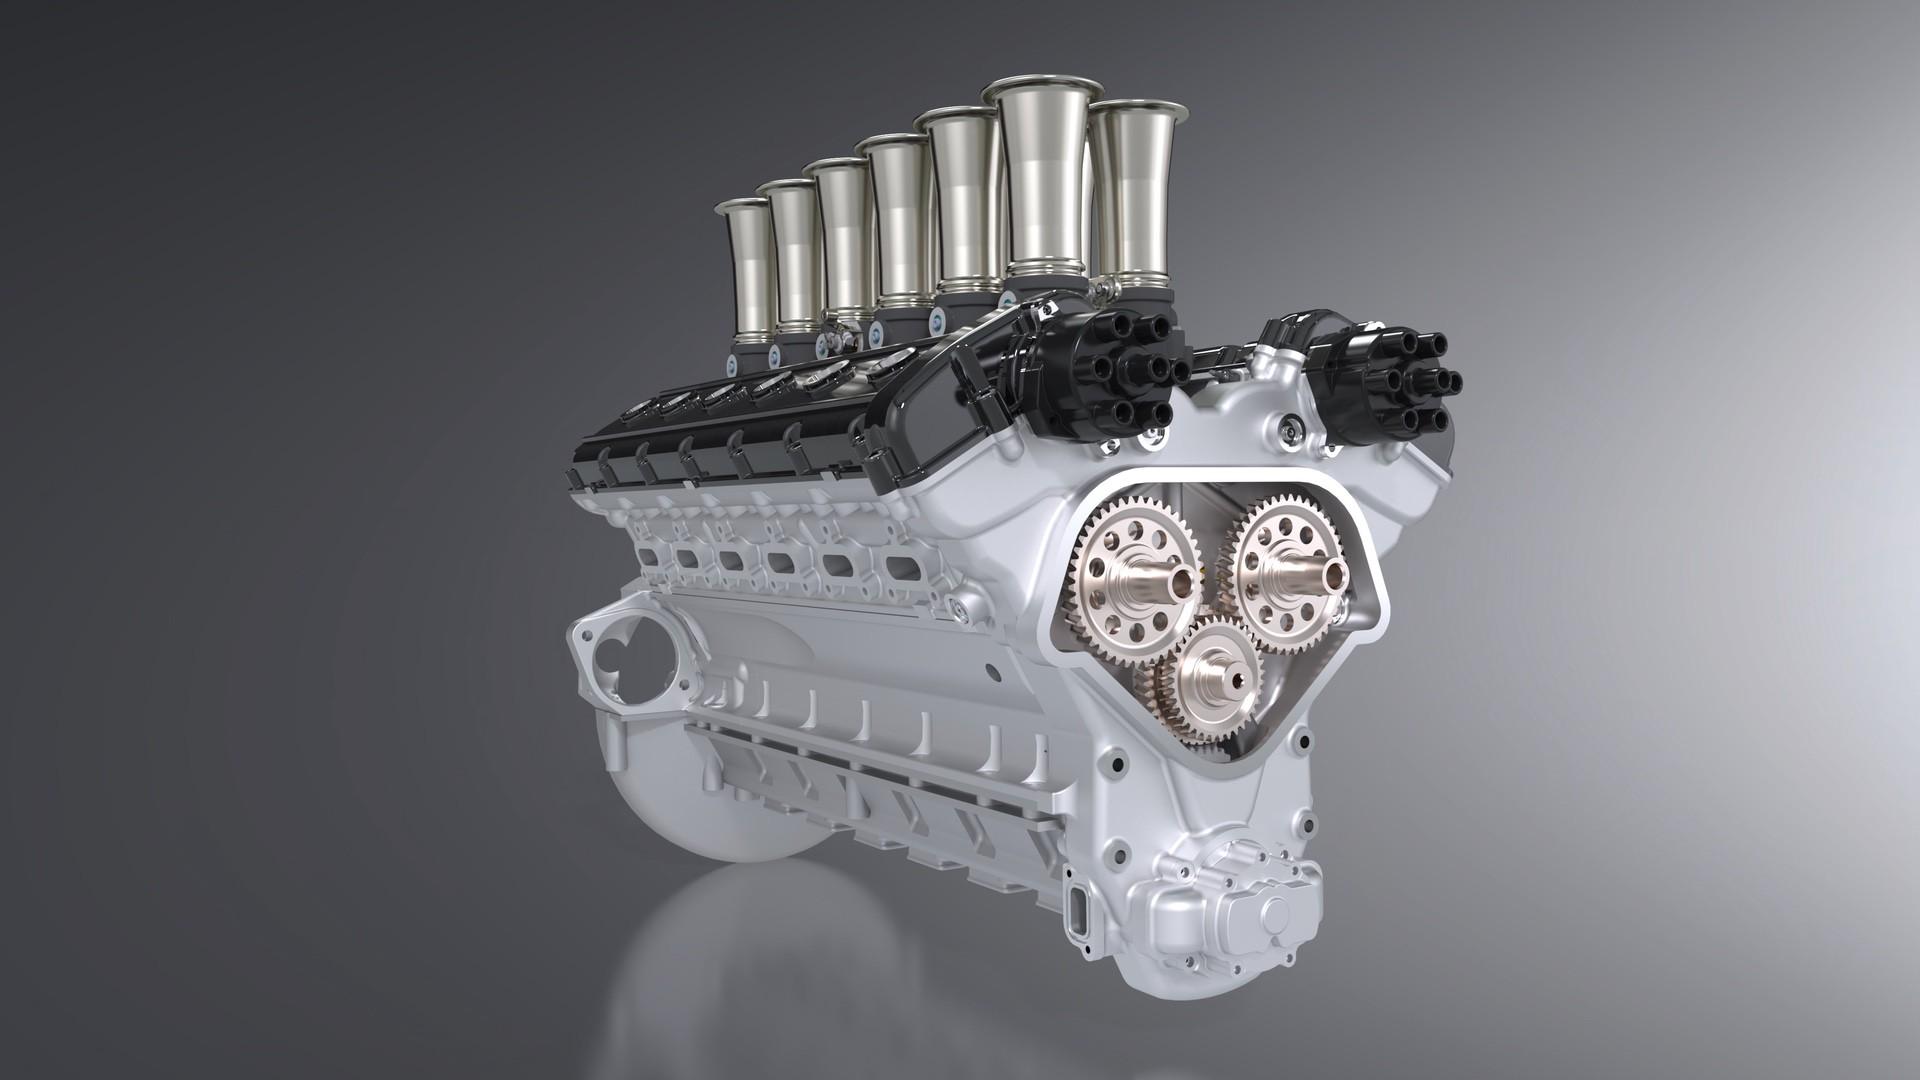 1.-GTO-Engineering-Squalo-V12-engine-overview-dark-background